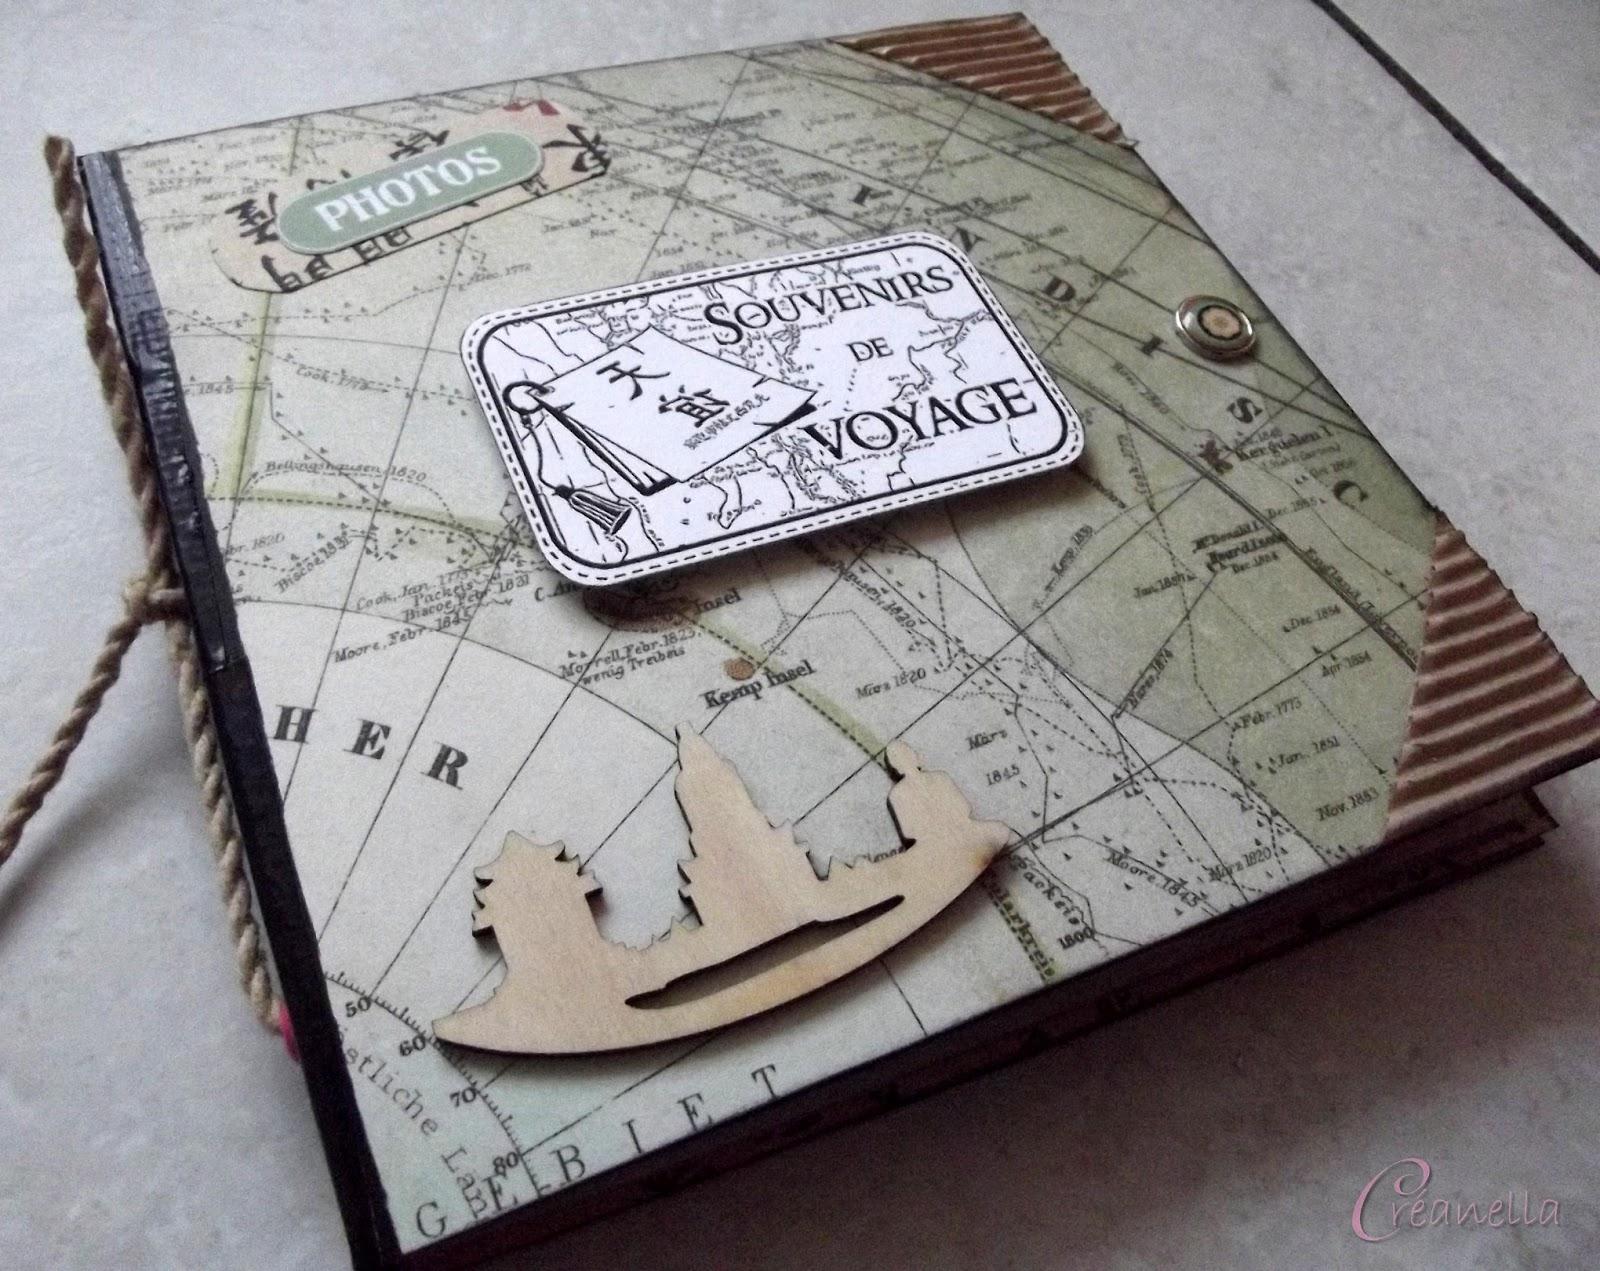 carnet-de-voyage-1427926481.jpg